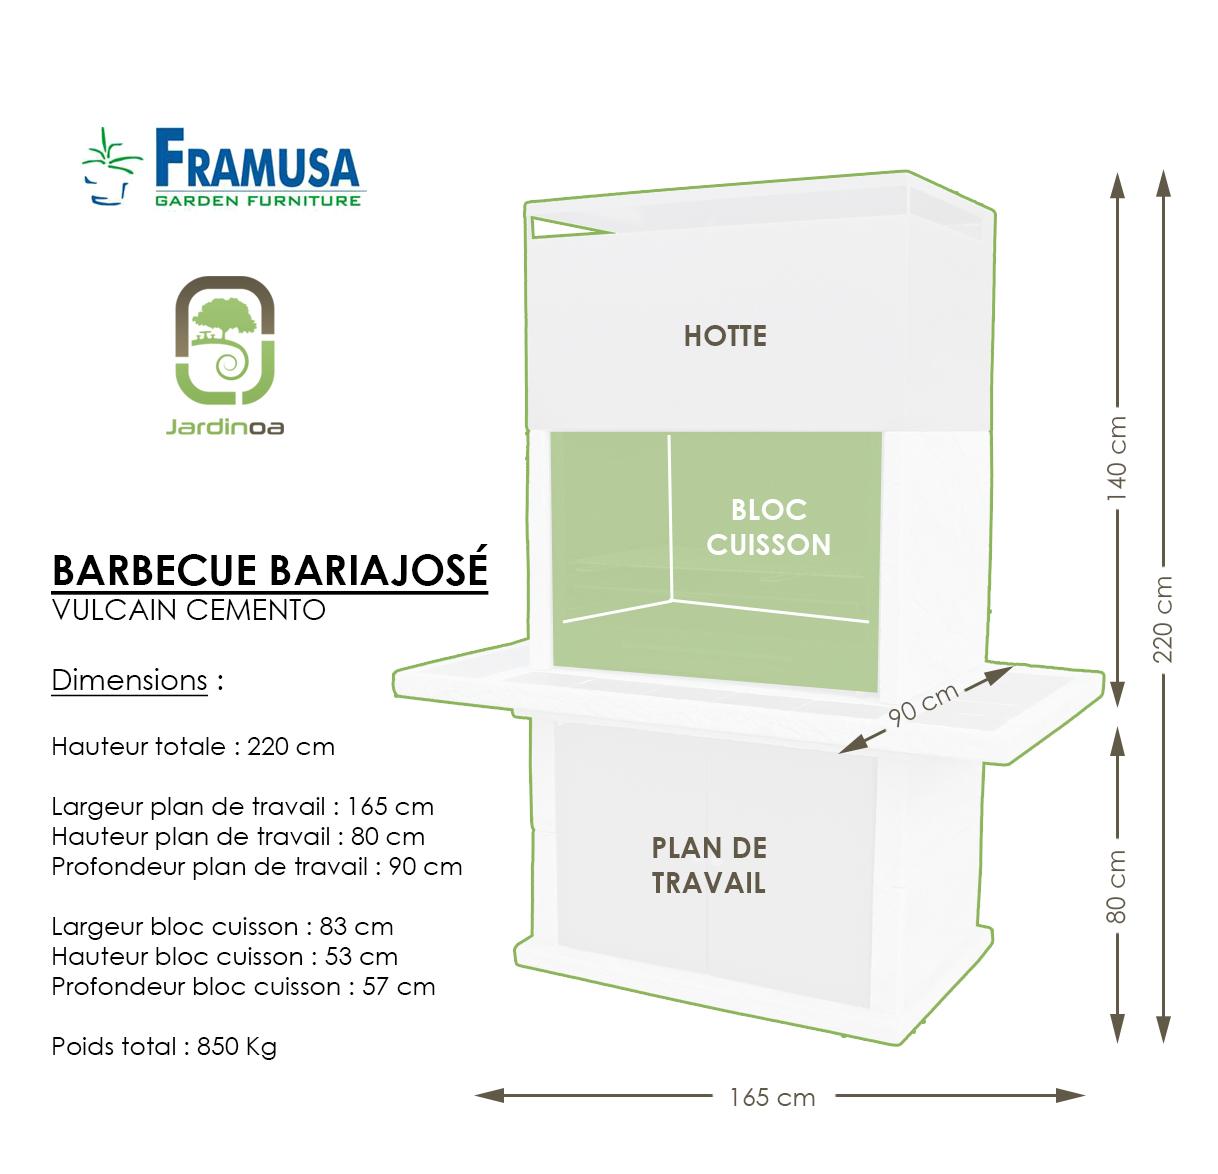 Cotes et nomenclature Barbecue Bariajosé